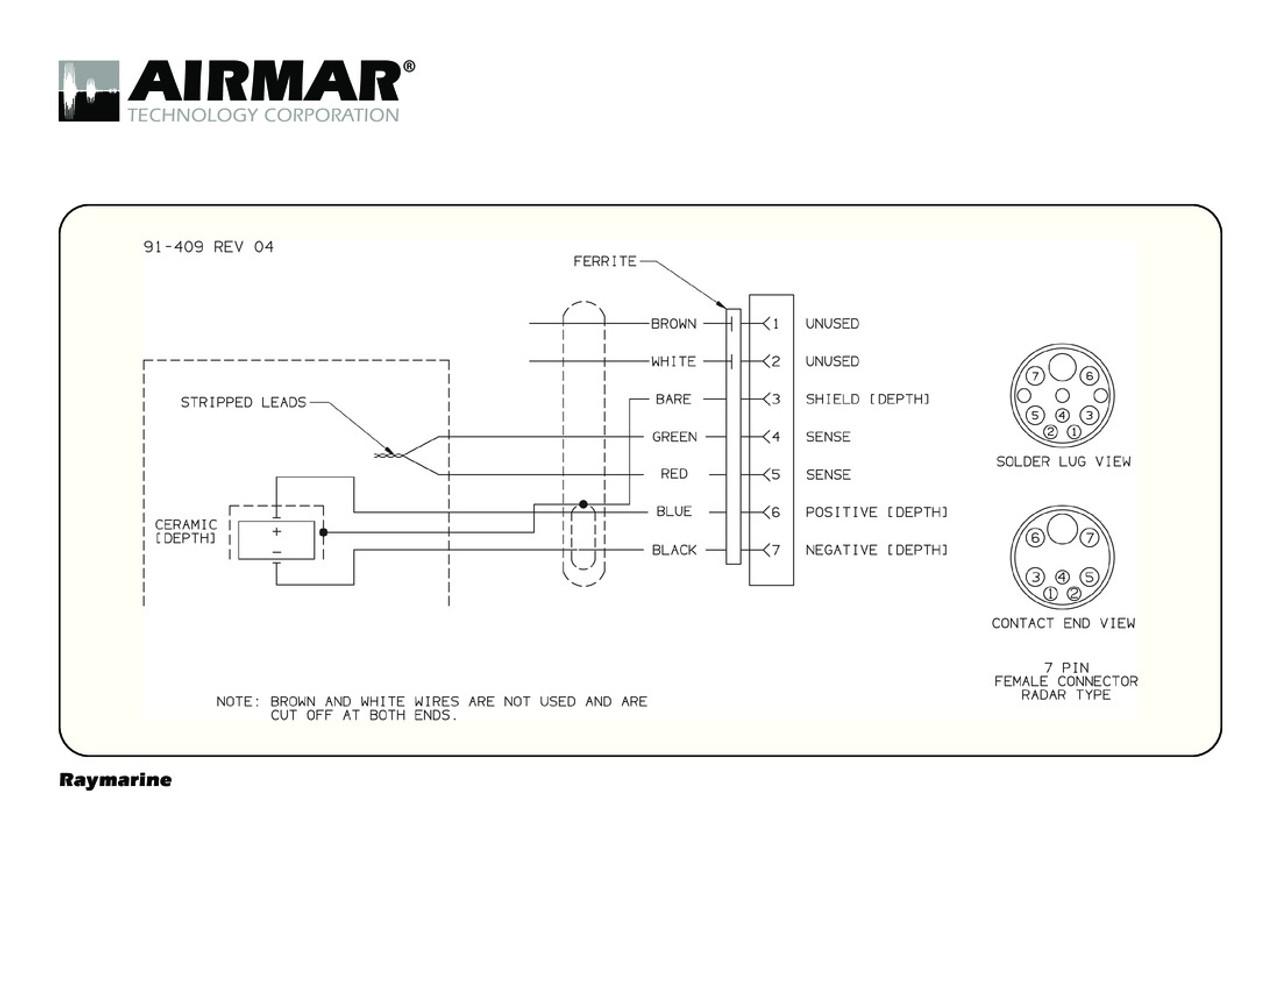 raymarine microphone wiring diagram wiring diagram post